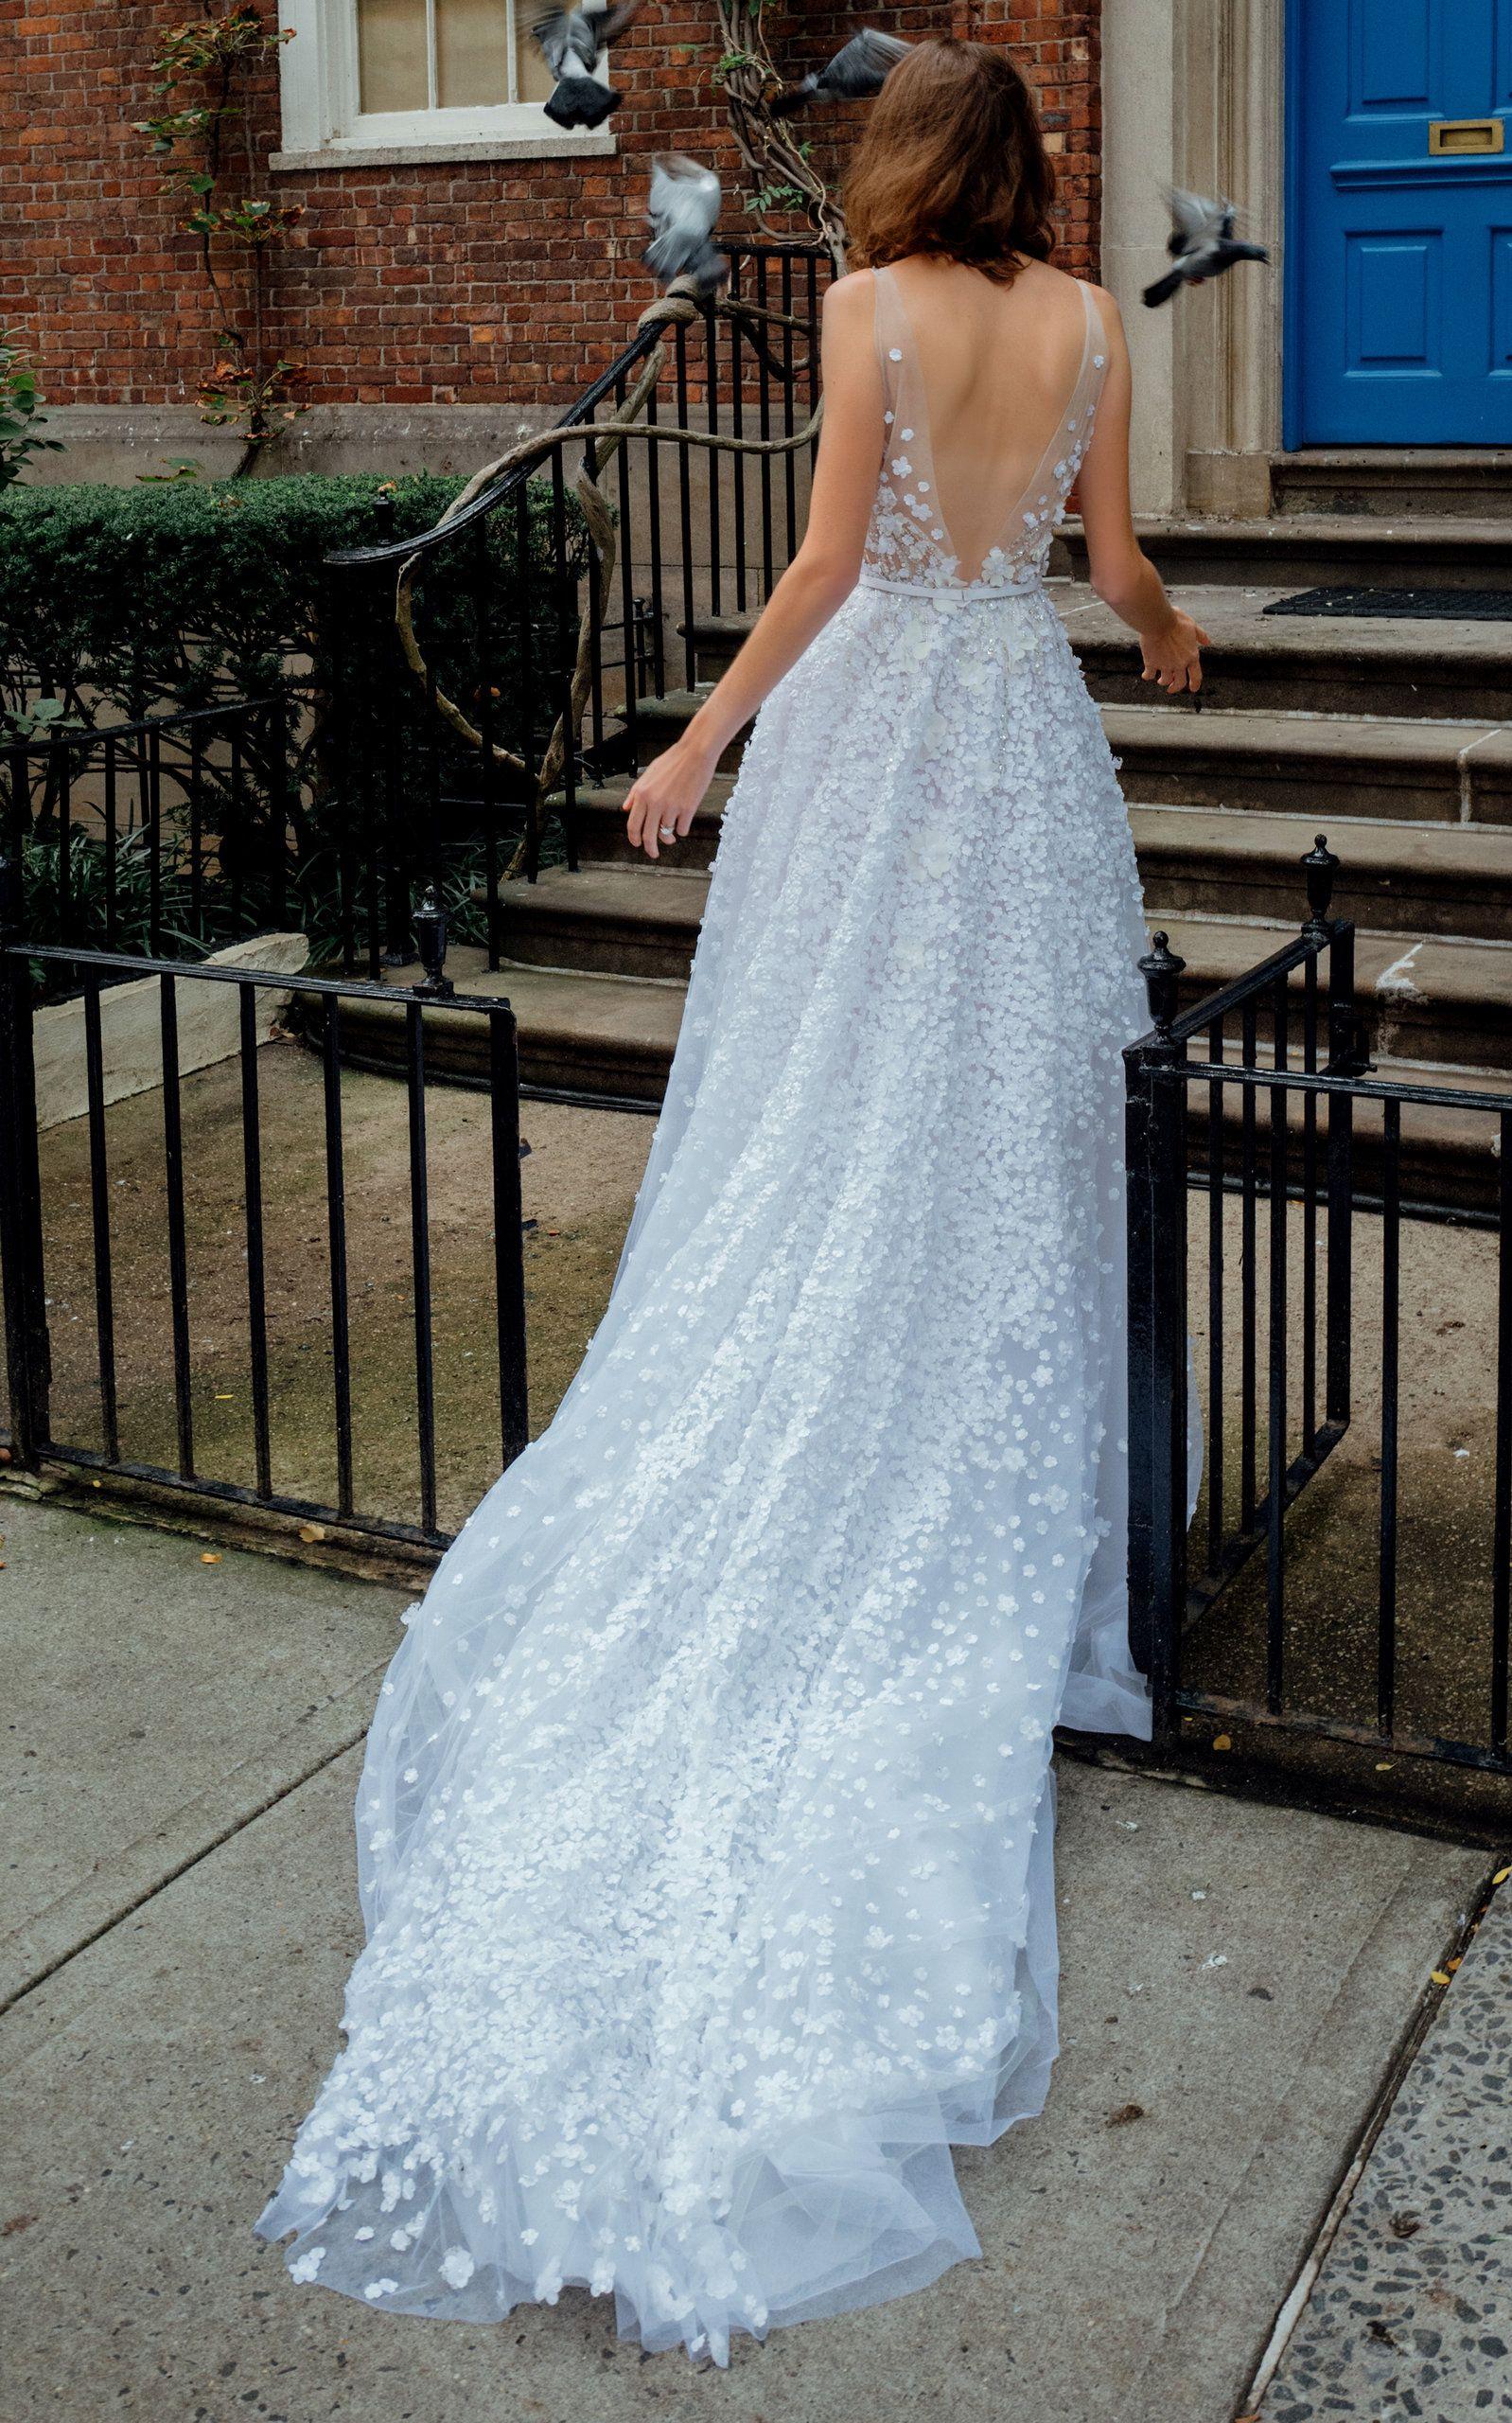 ba98217638a9 70 Best Bohemian Wedding Dresses - Boho Wedding Dress Ideas for Hippie  Brides